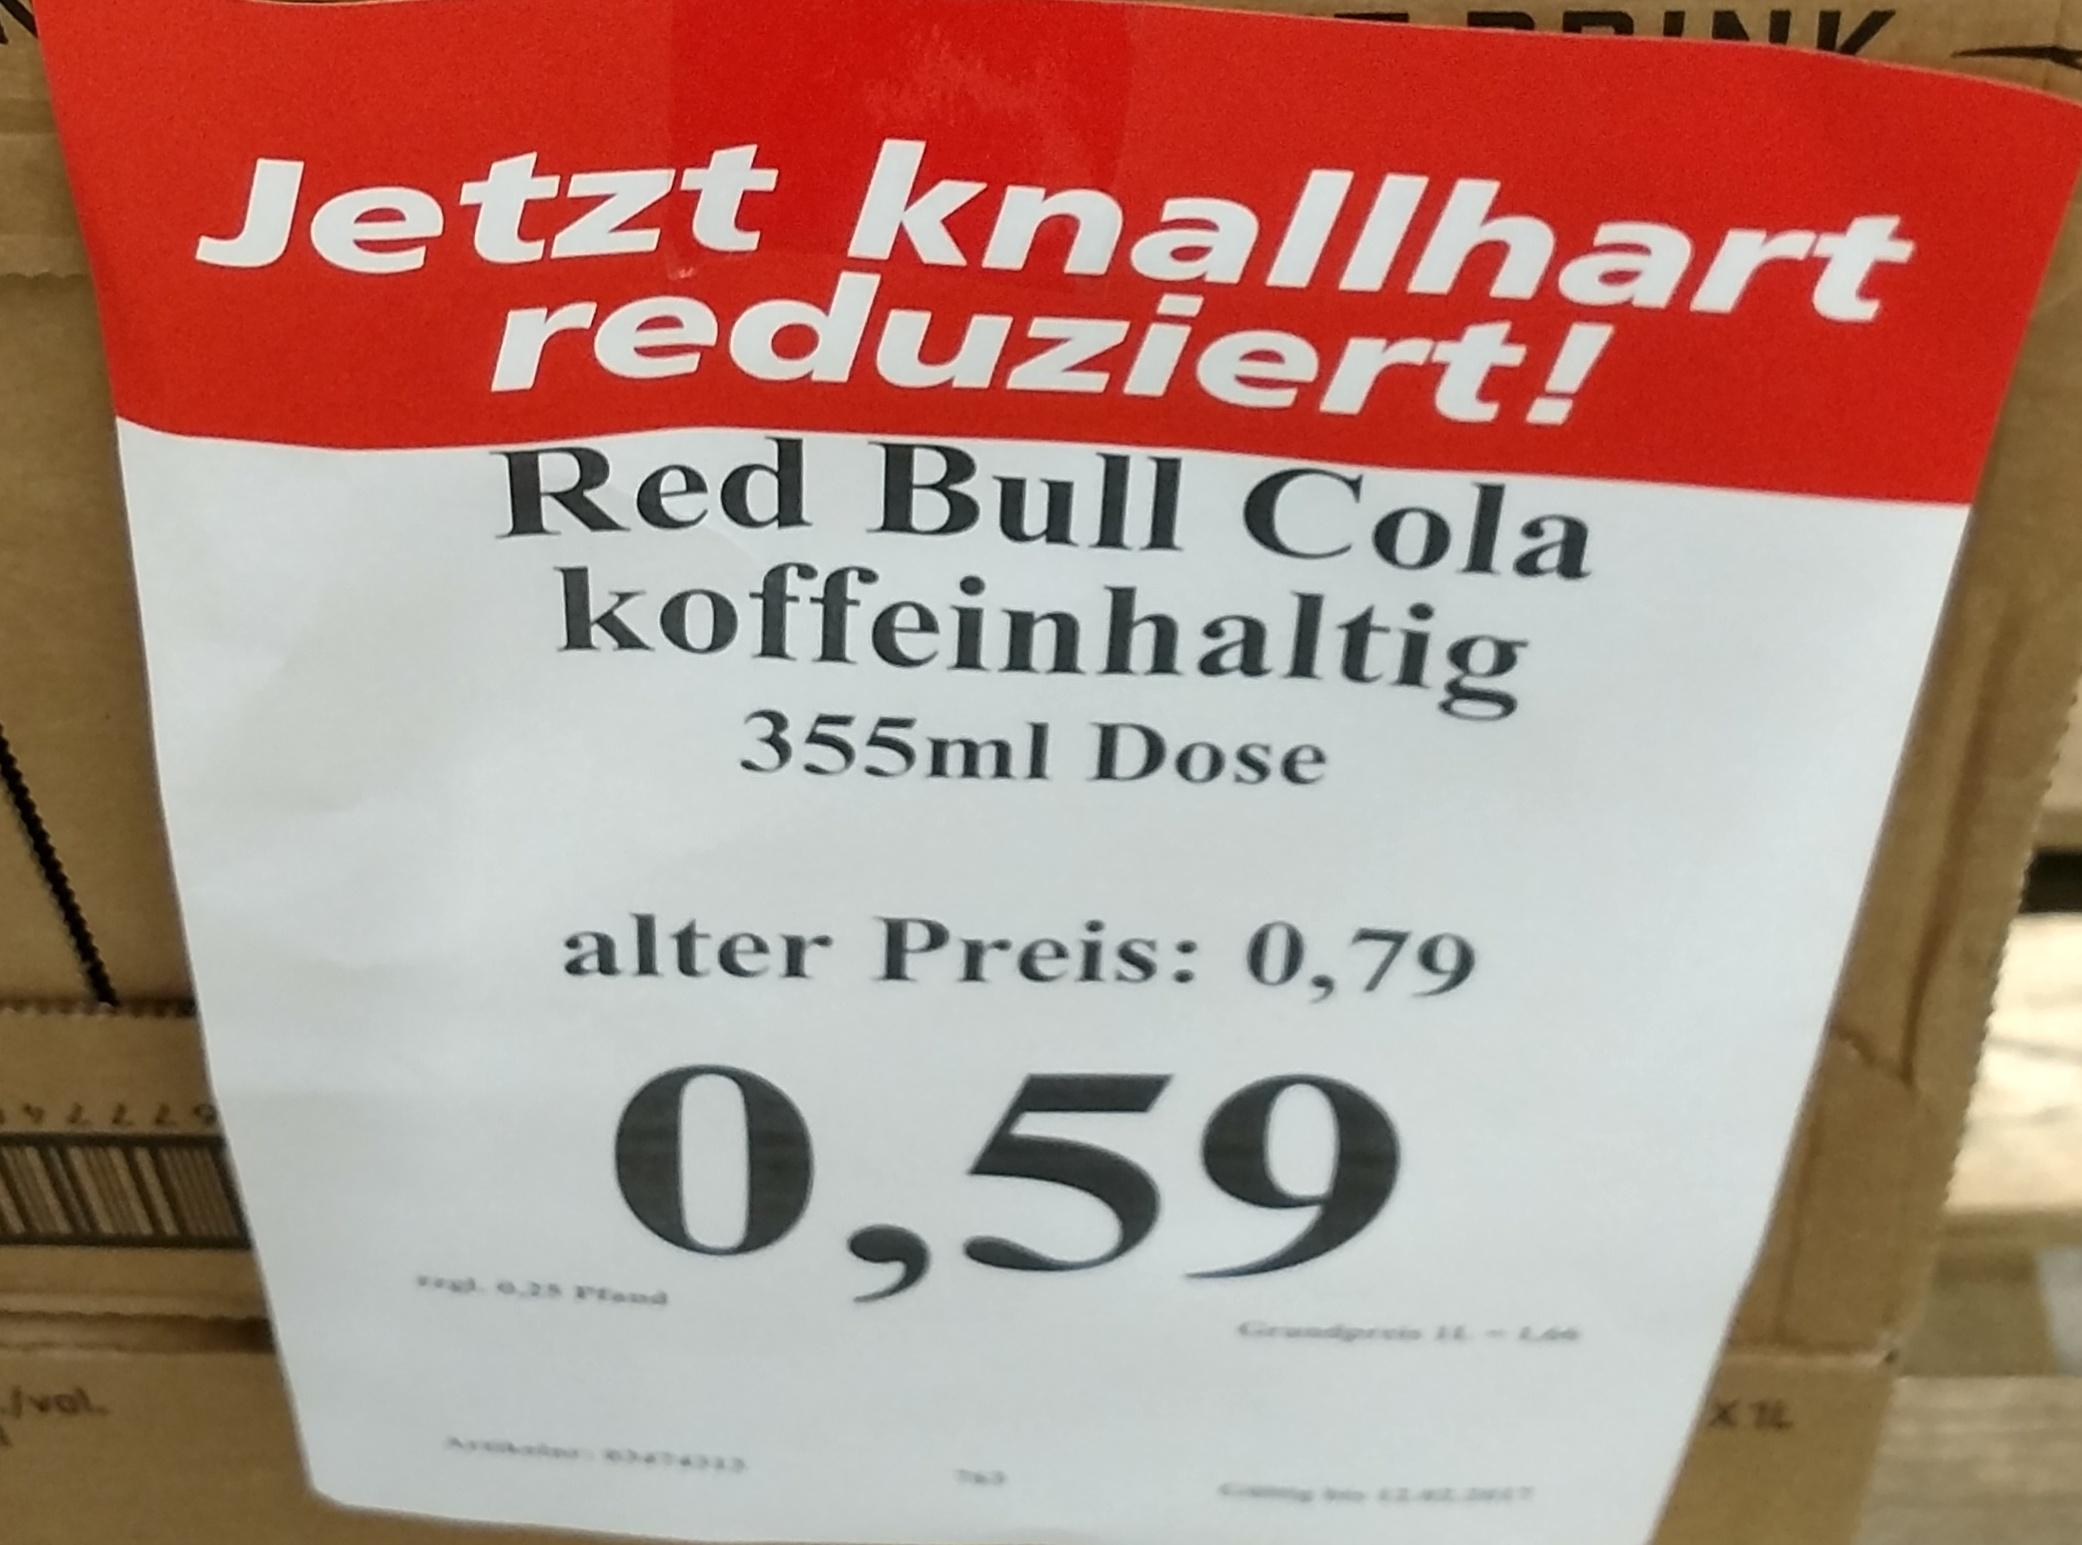 [Lokal Thomas Philipps] Red Bull Cola 355 ml - 59 Cent / Mezzo Mix Zero 0,5 L - 29 Cent